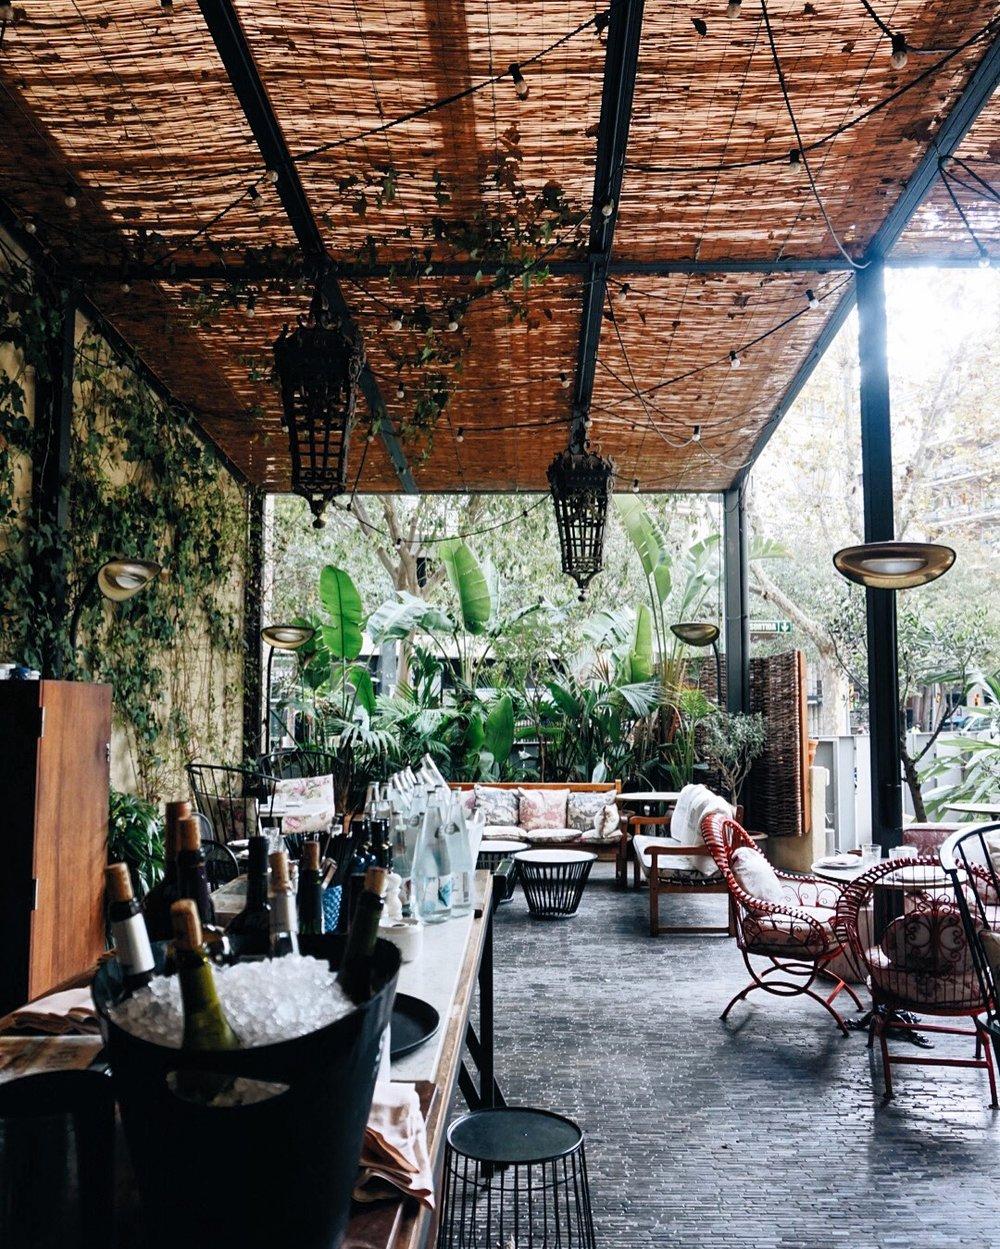 Chez Coco Barcelona